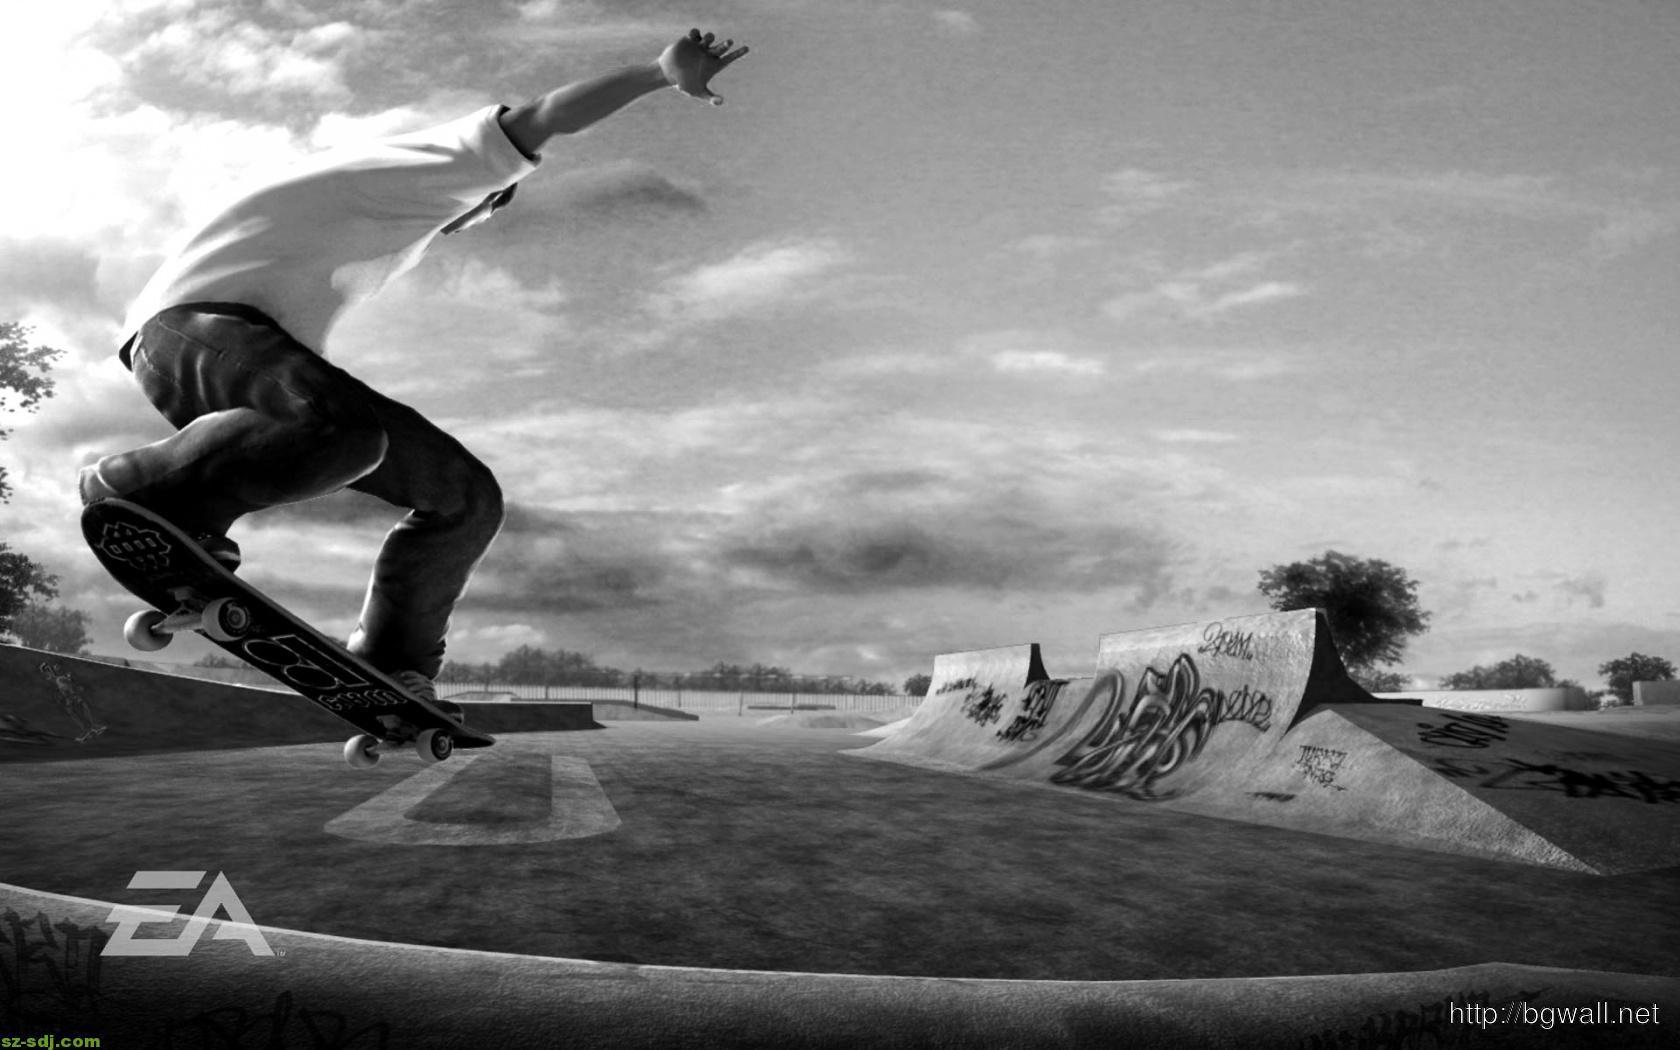 ea-skateboarding-sport-wallpaper